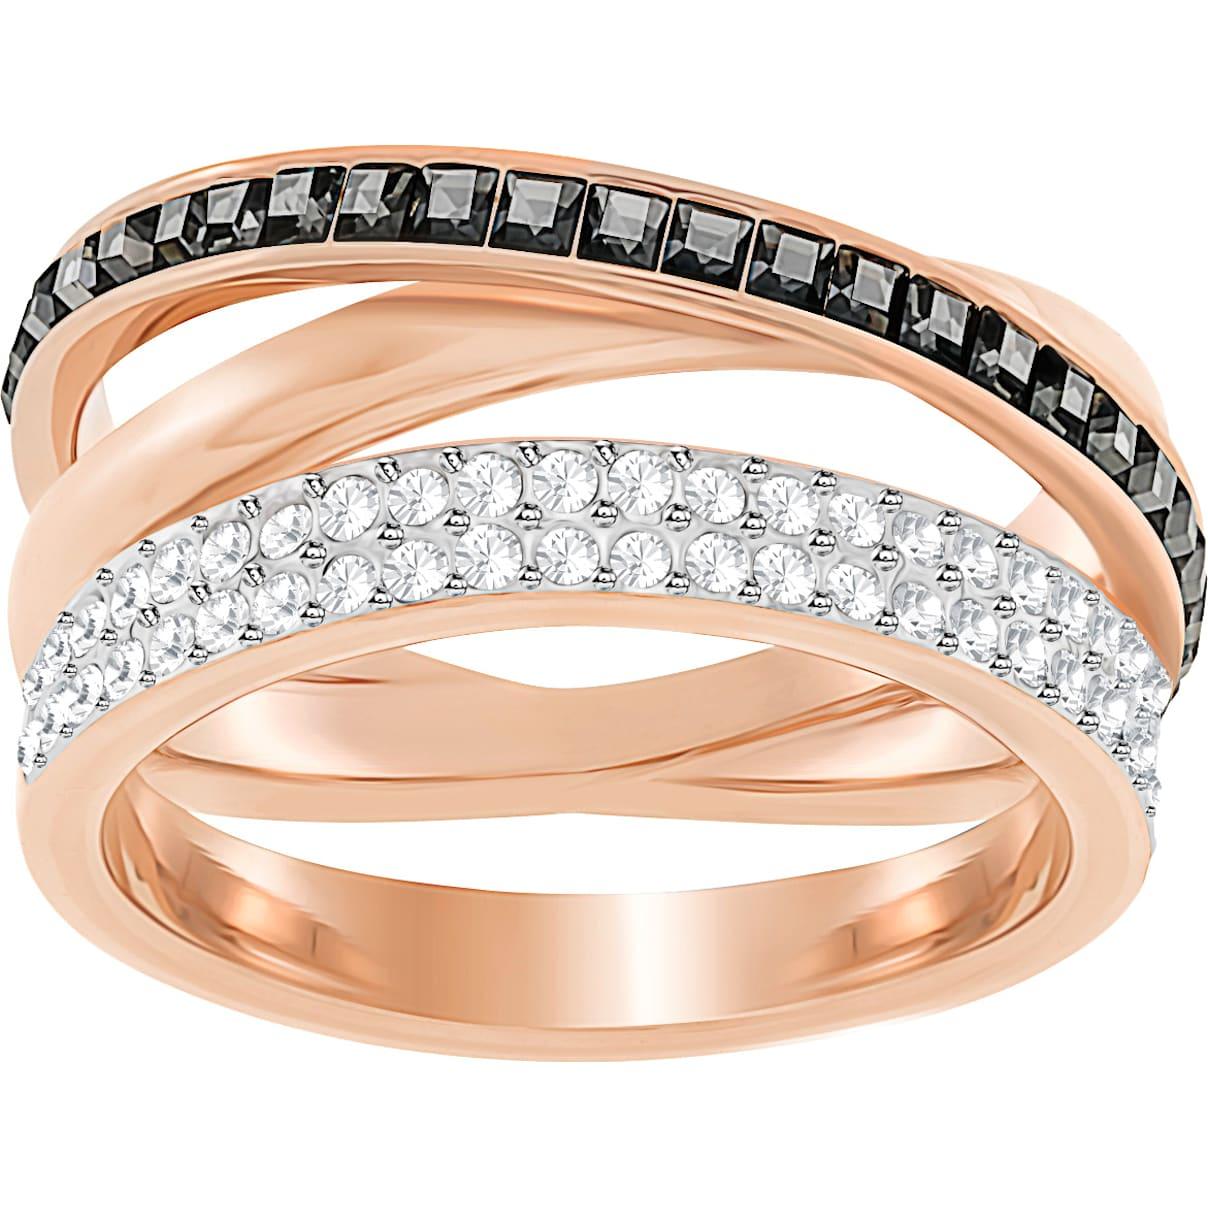 Hero Ring, grau, Rosé vergoldet